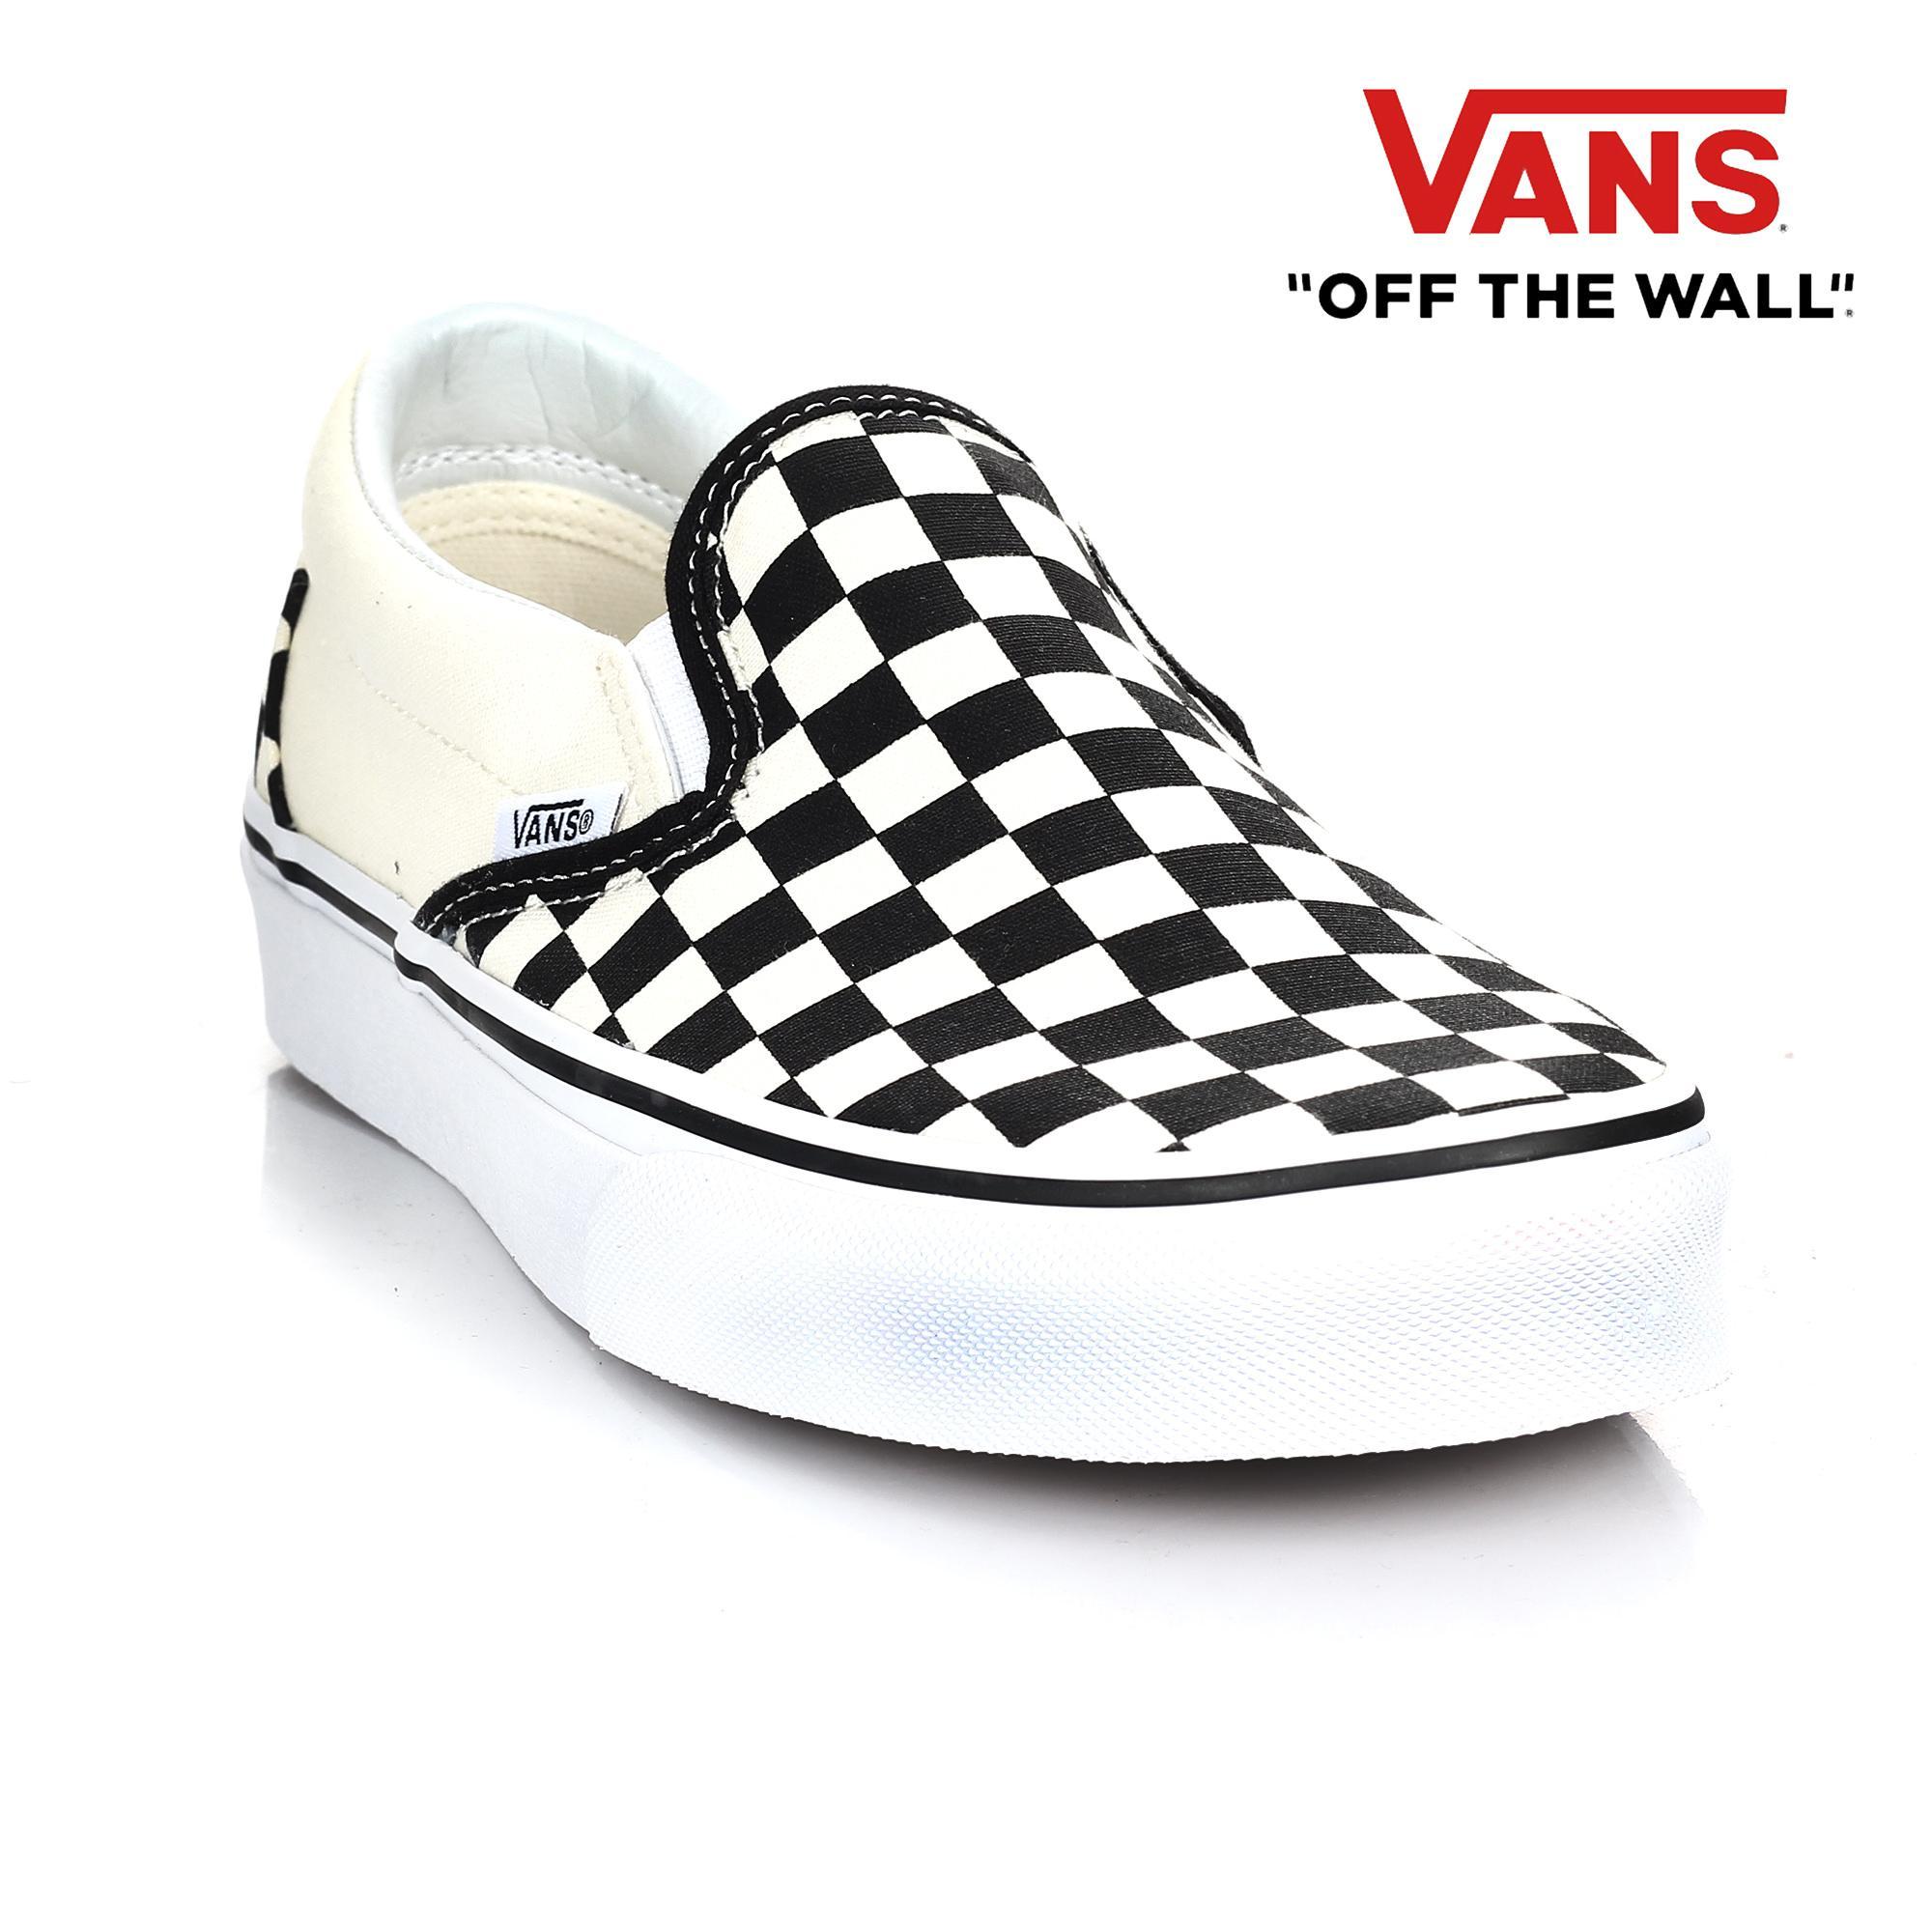 class a vans shoes philippines